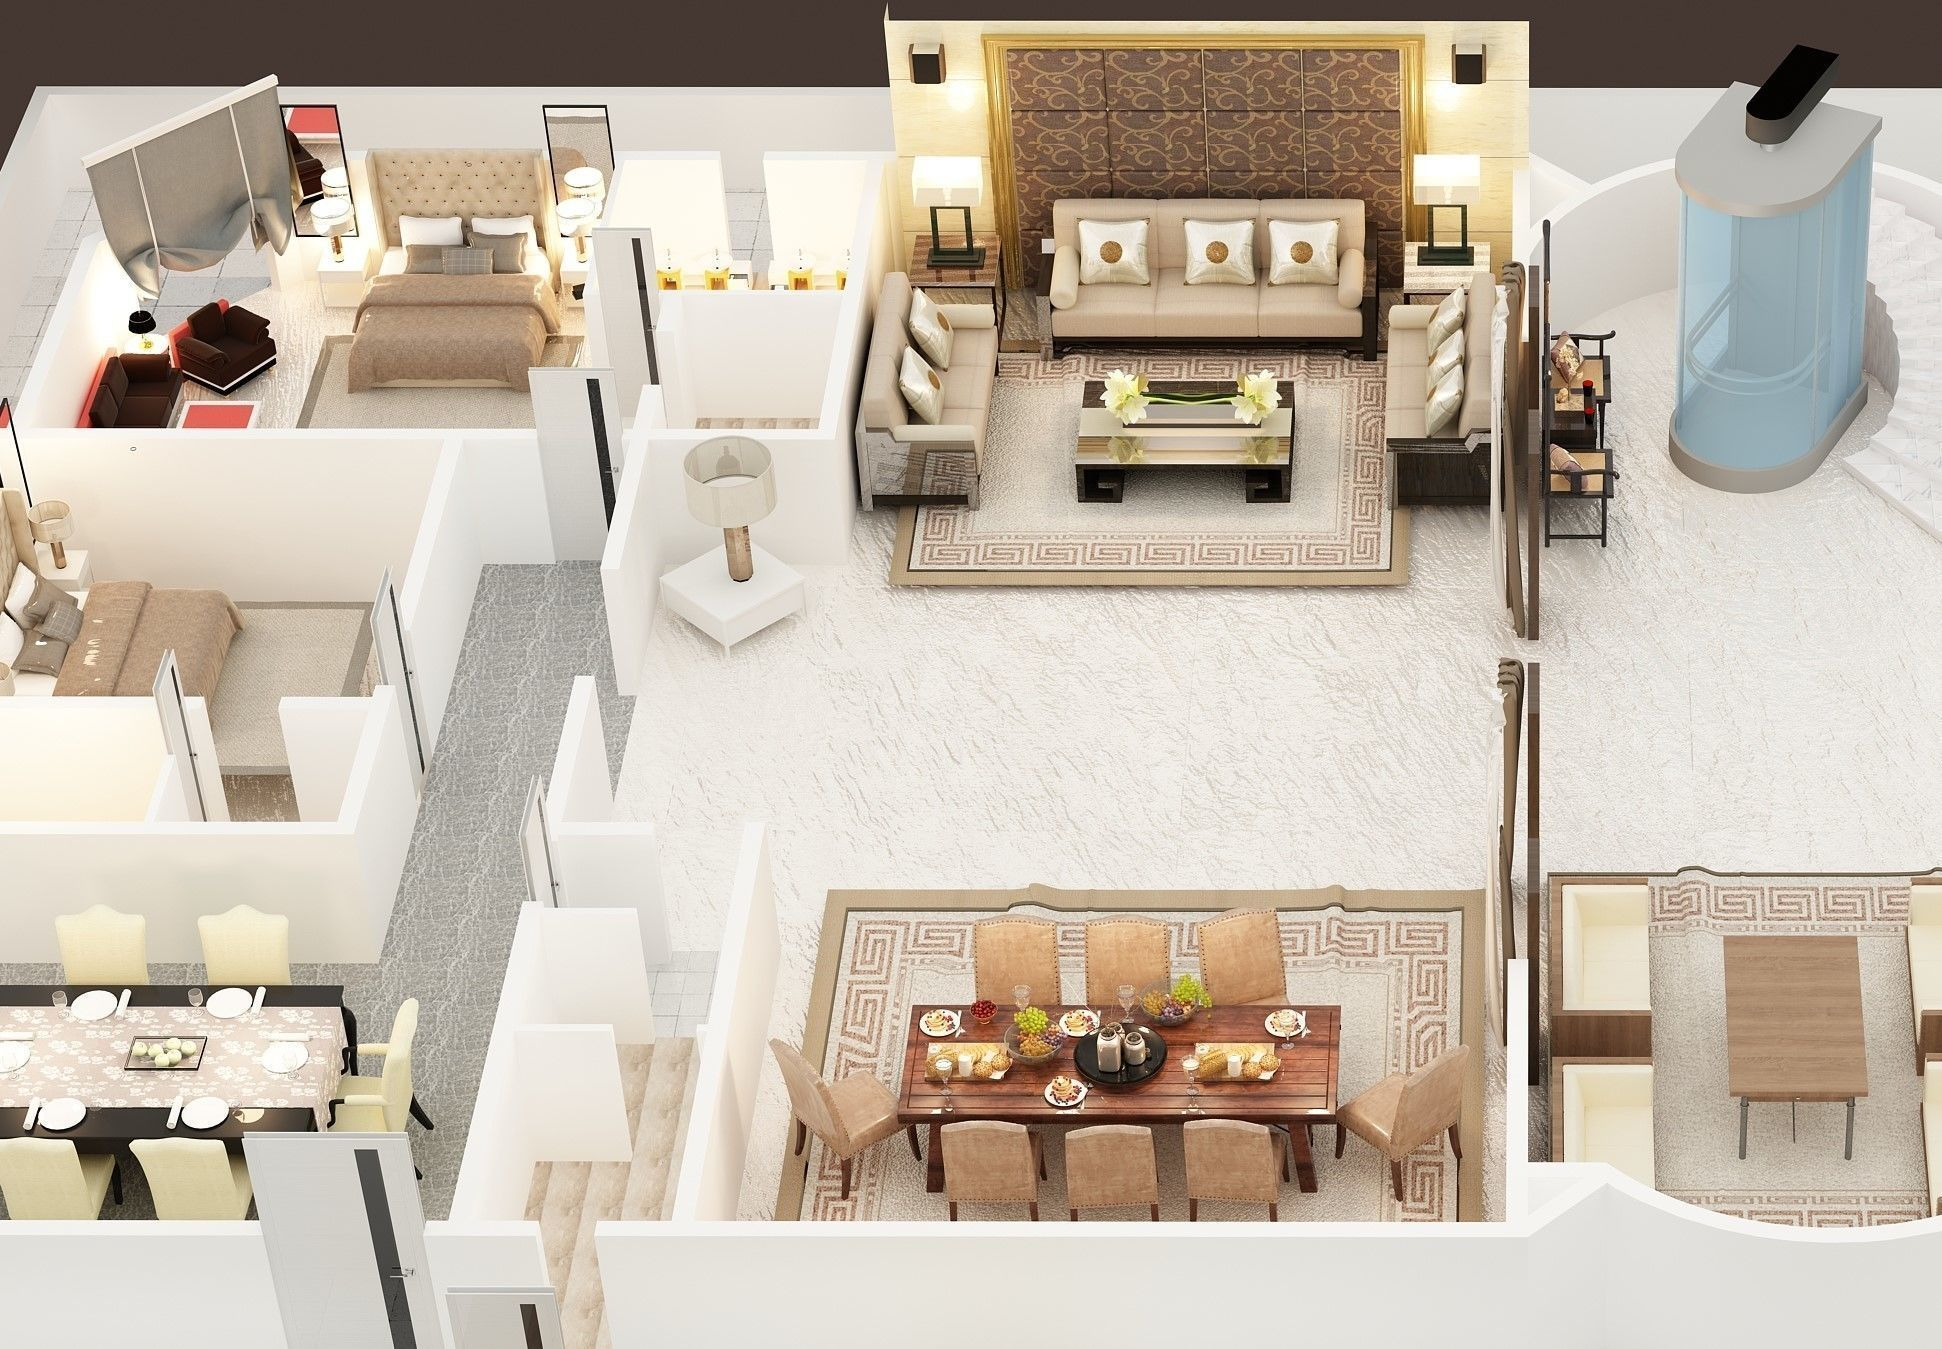 3d Floor Plan Of Luxury House Ground Foor 3d Cgtrader Luxury Plan Architectural Decoration Luxury House